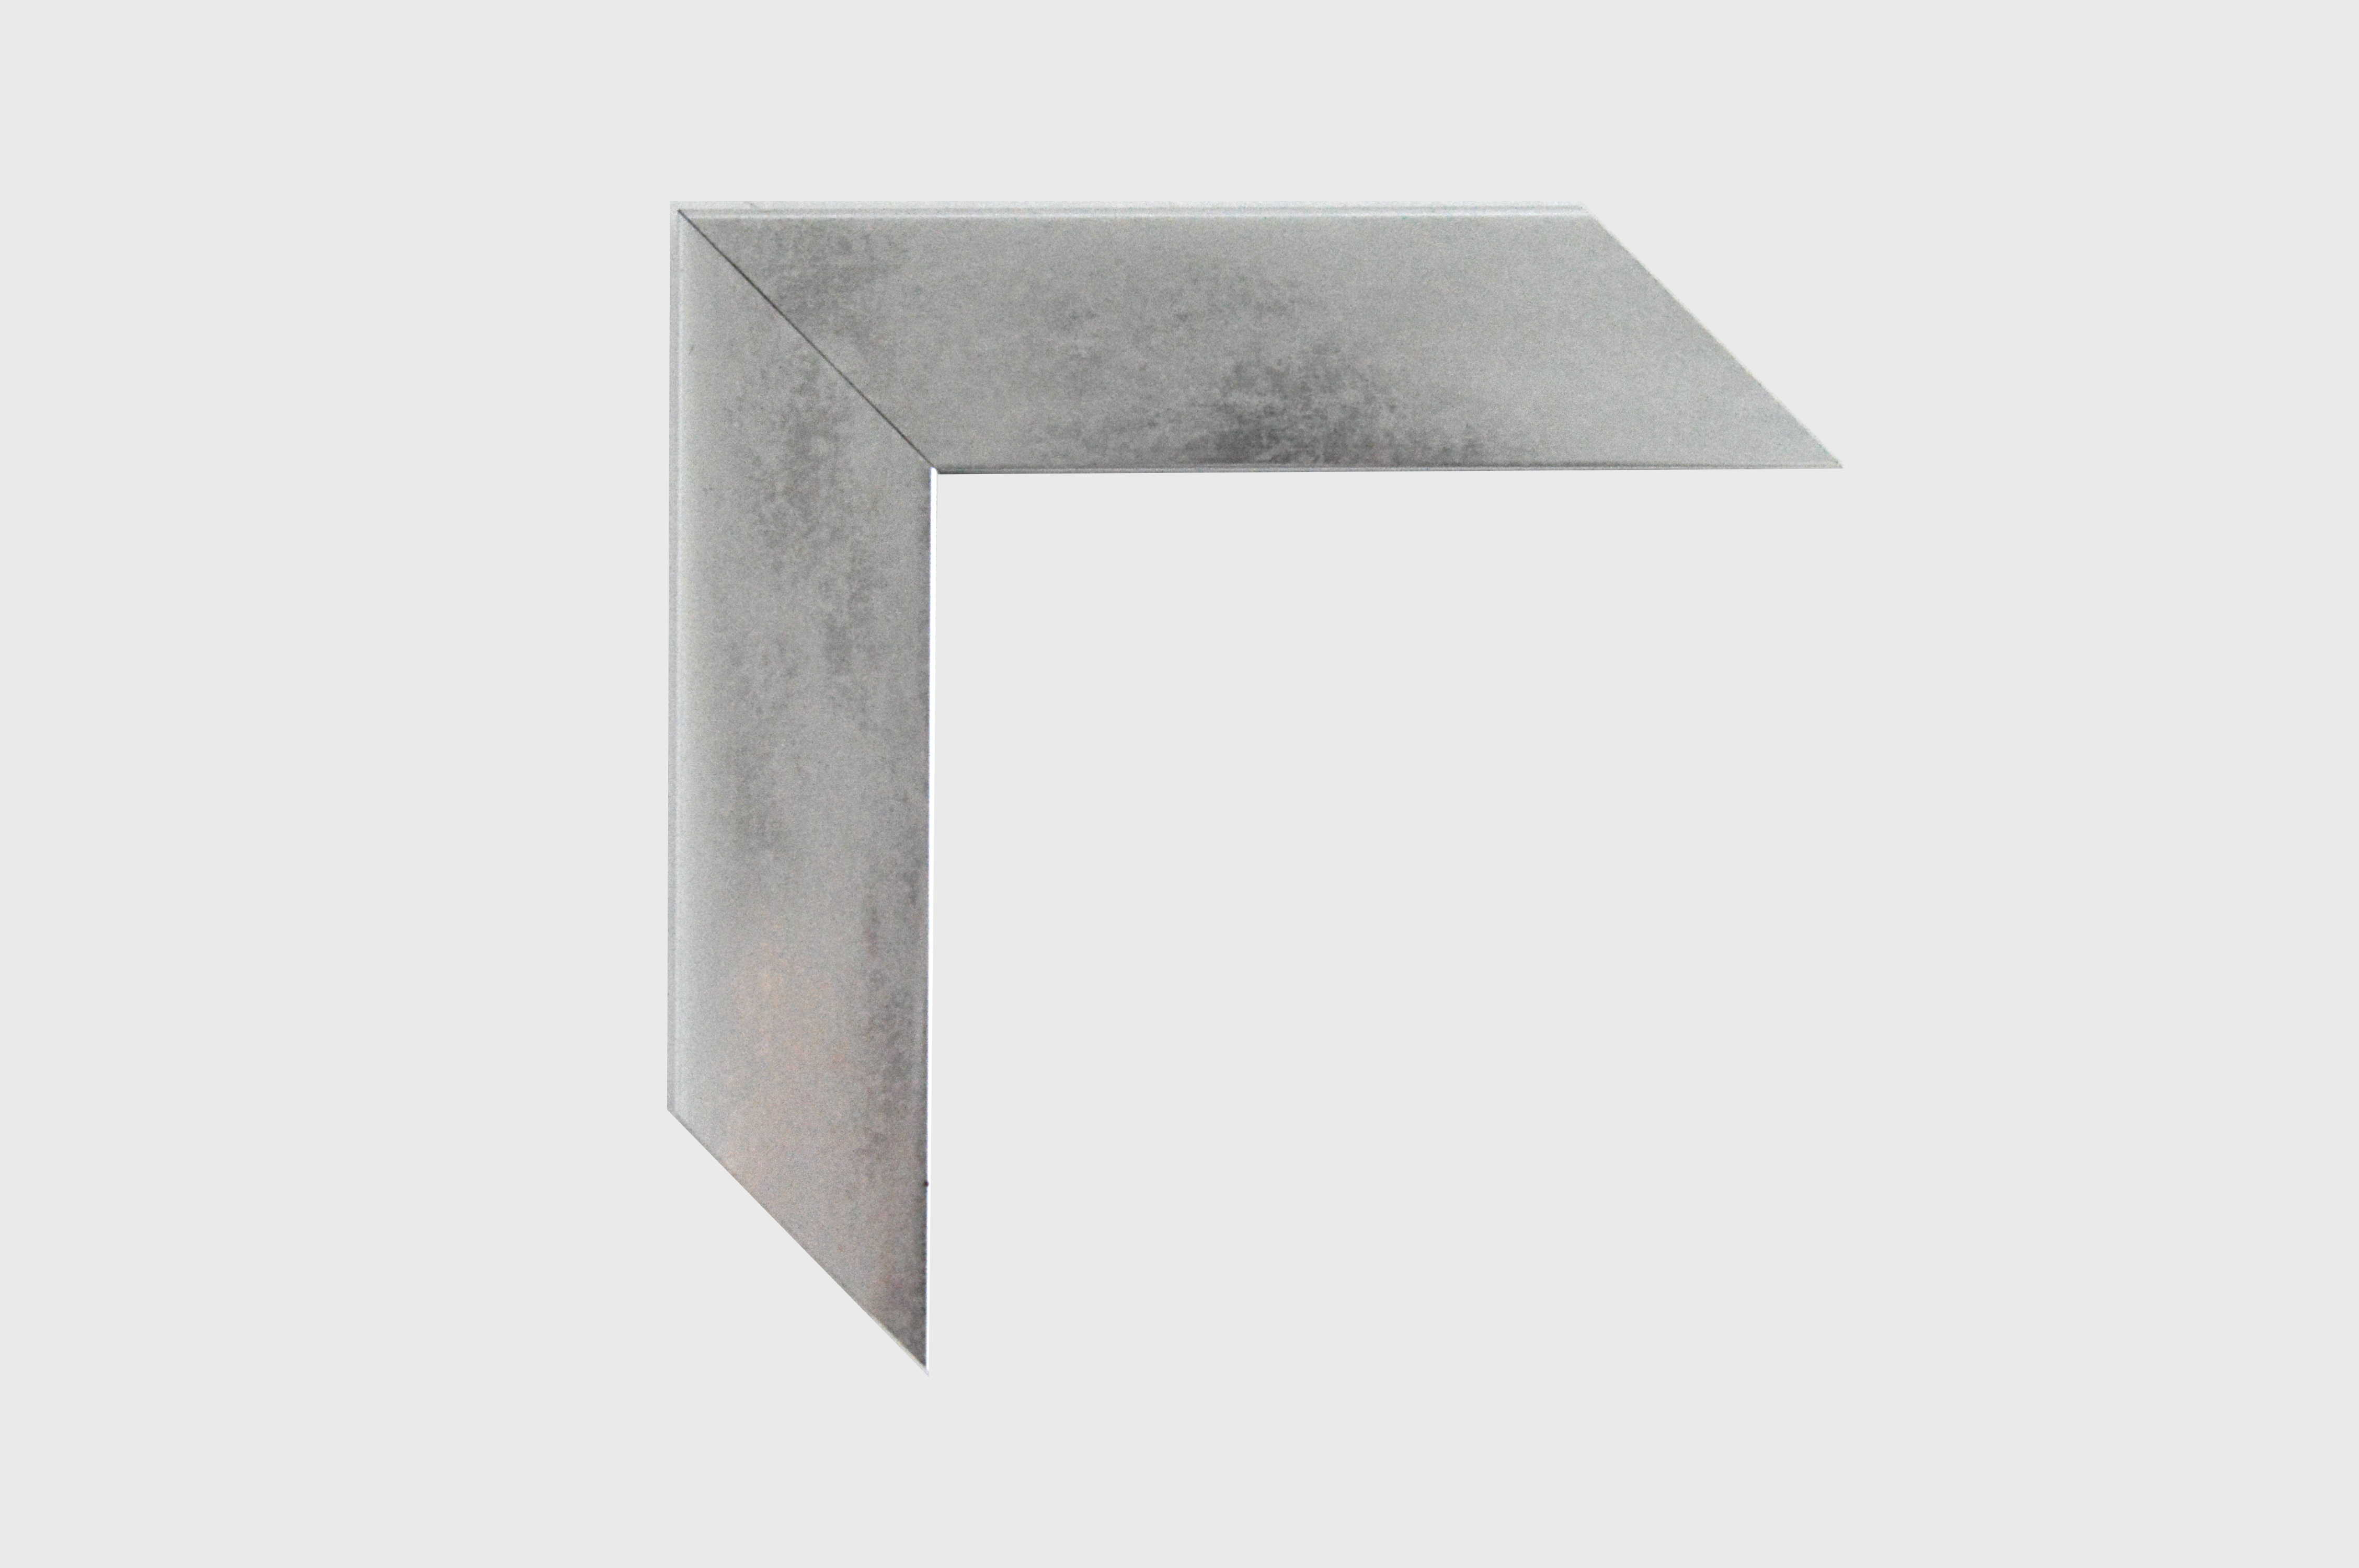 00468-770-PLATA-ancho4.2cm